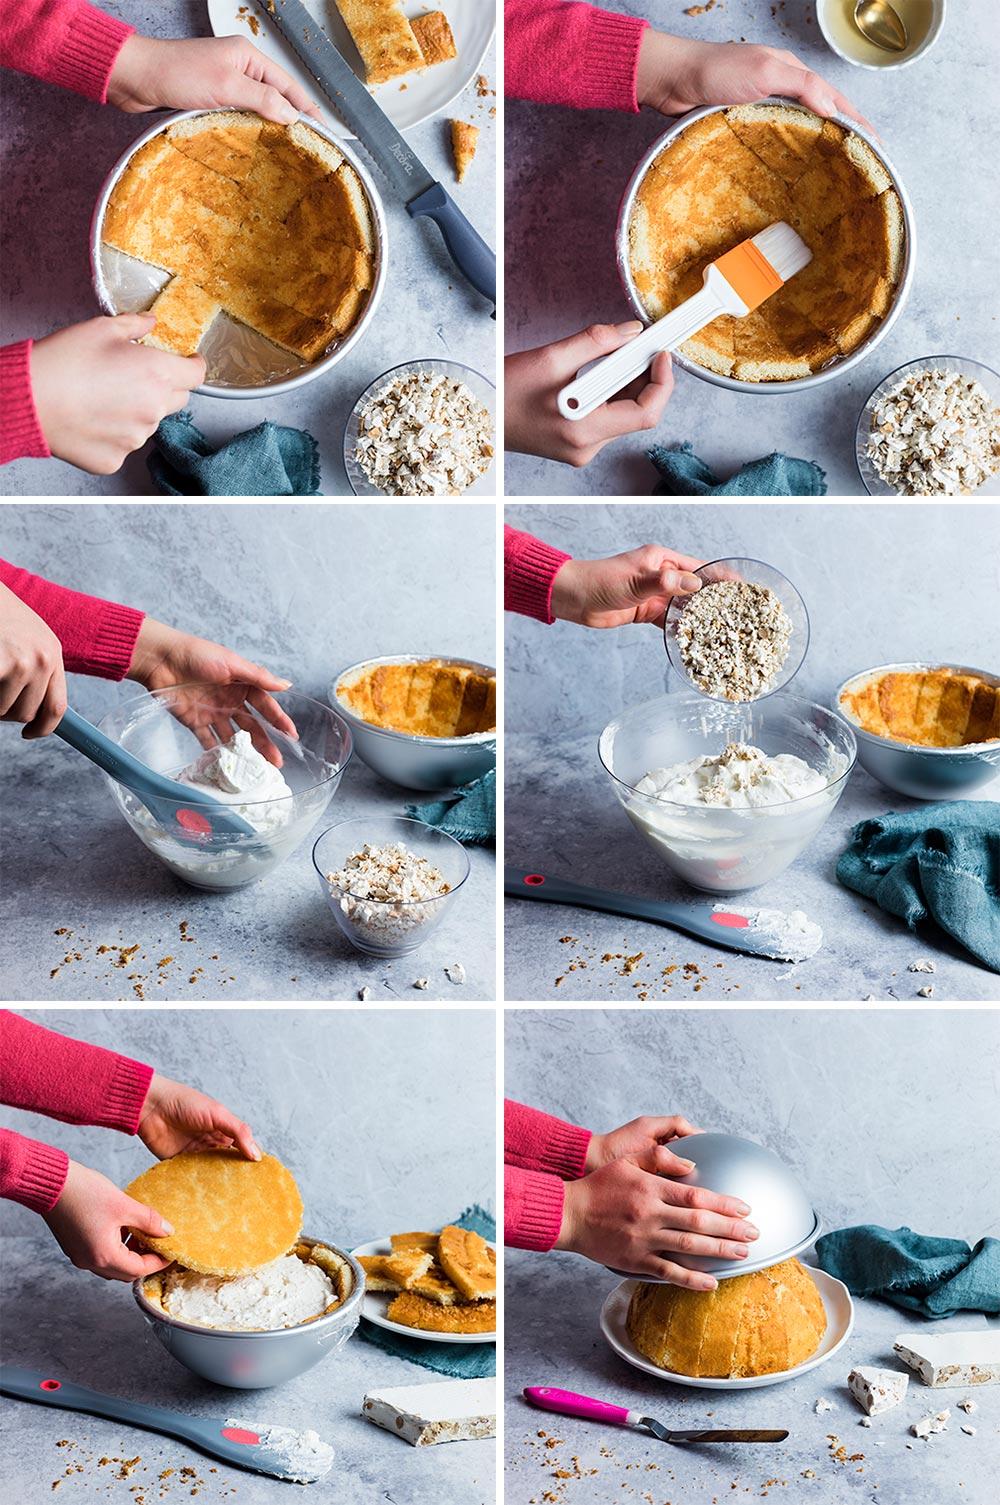 Zuccotto al torrone - step by step